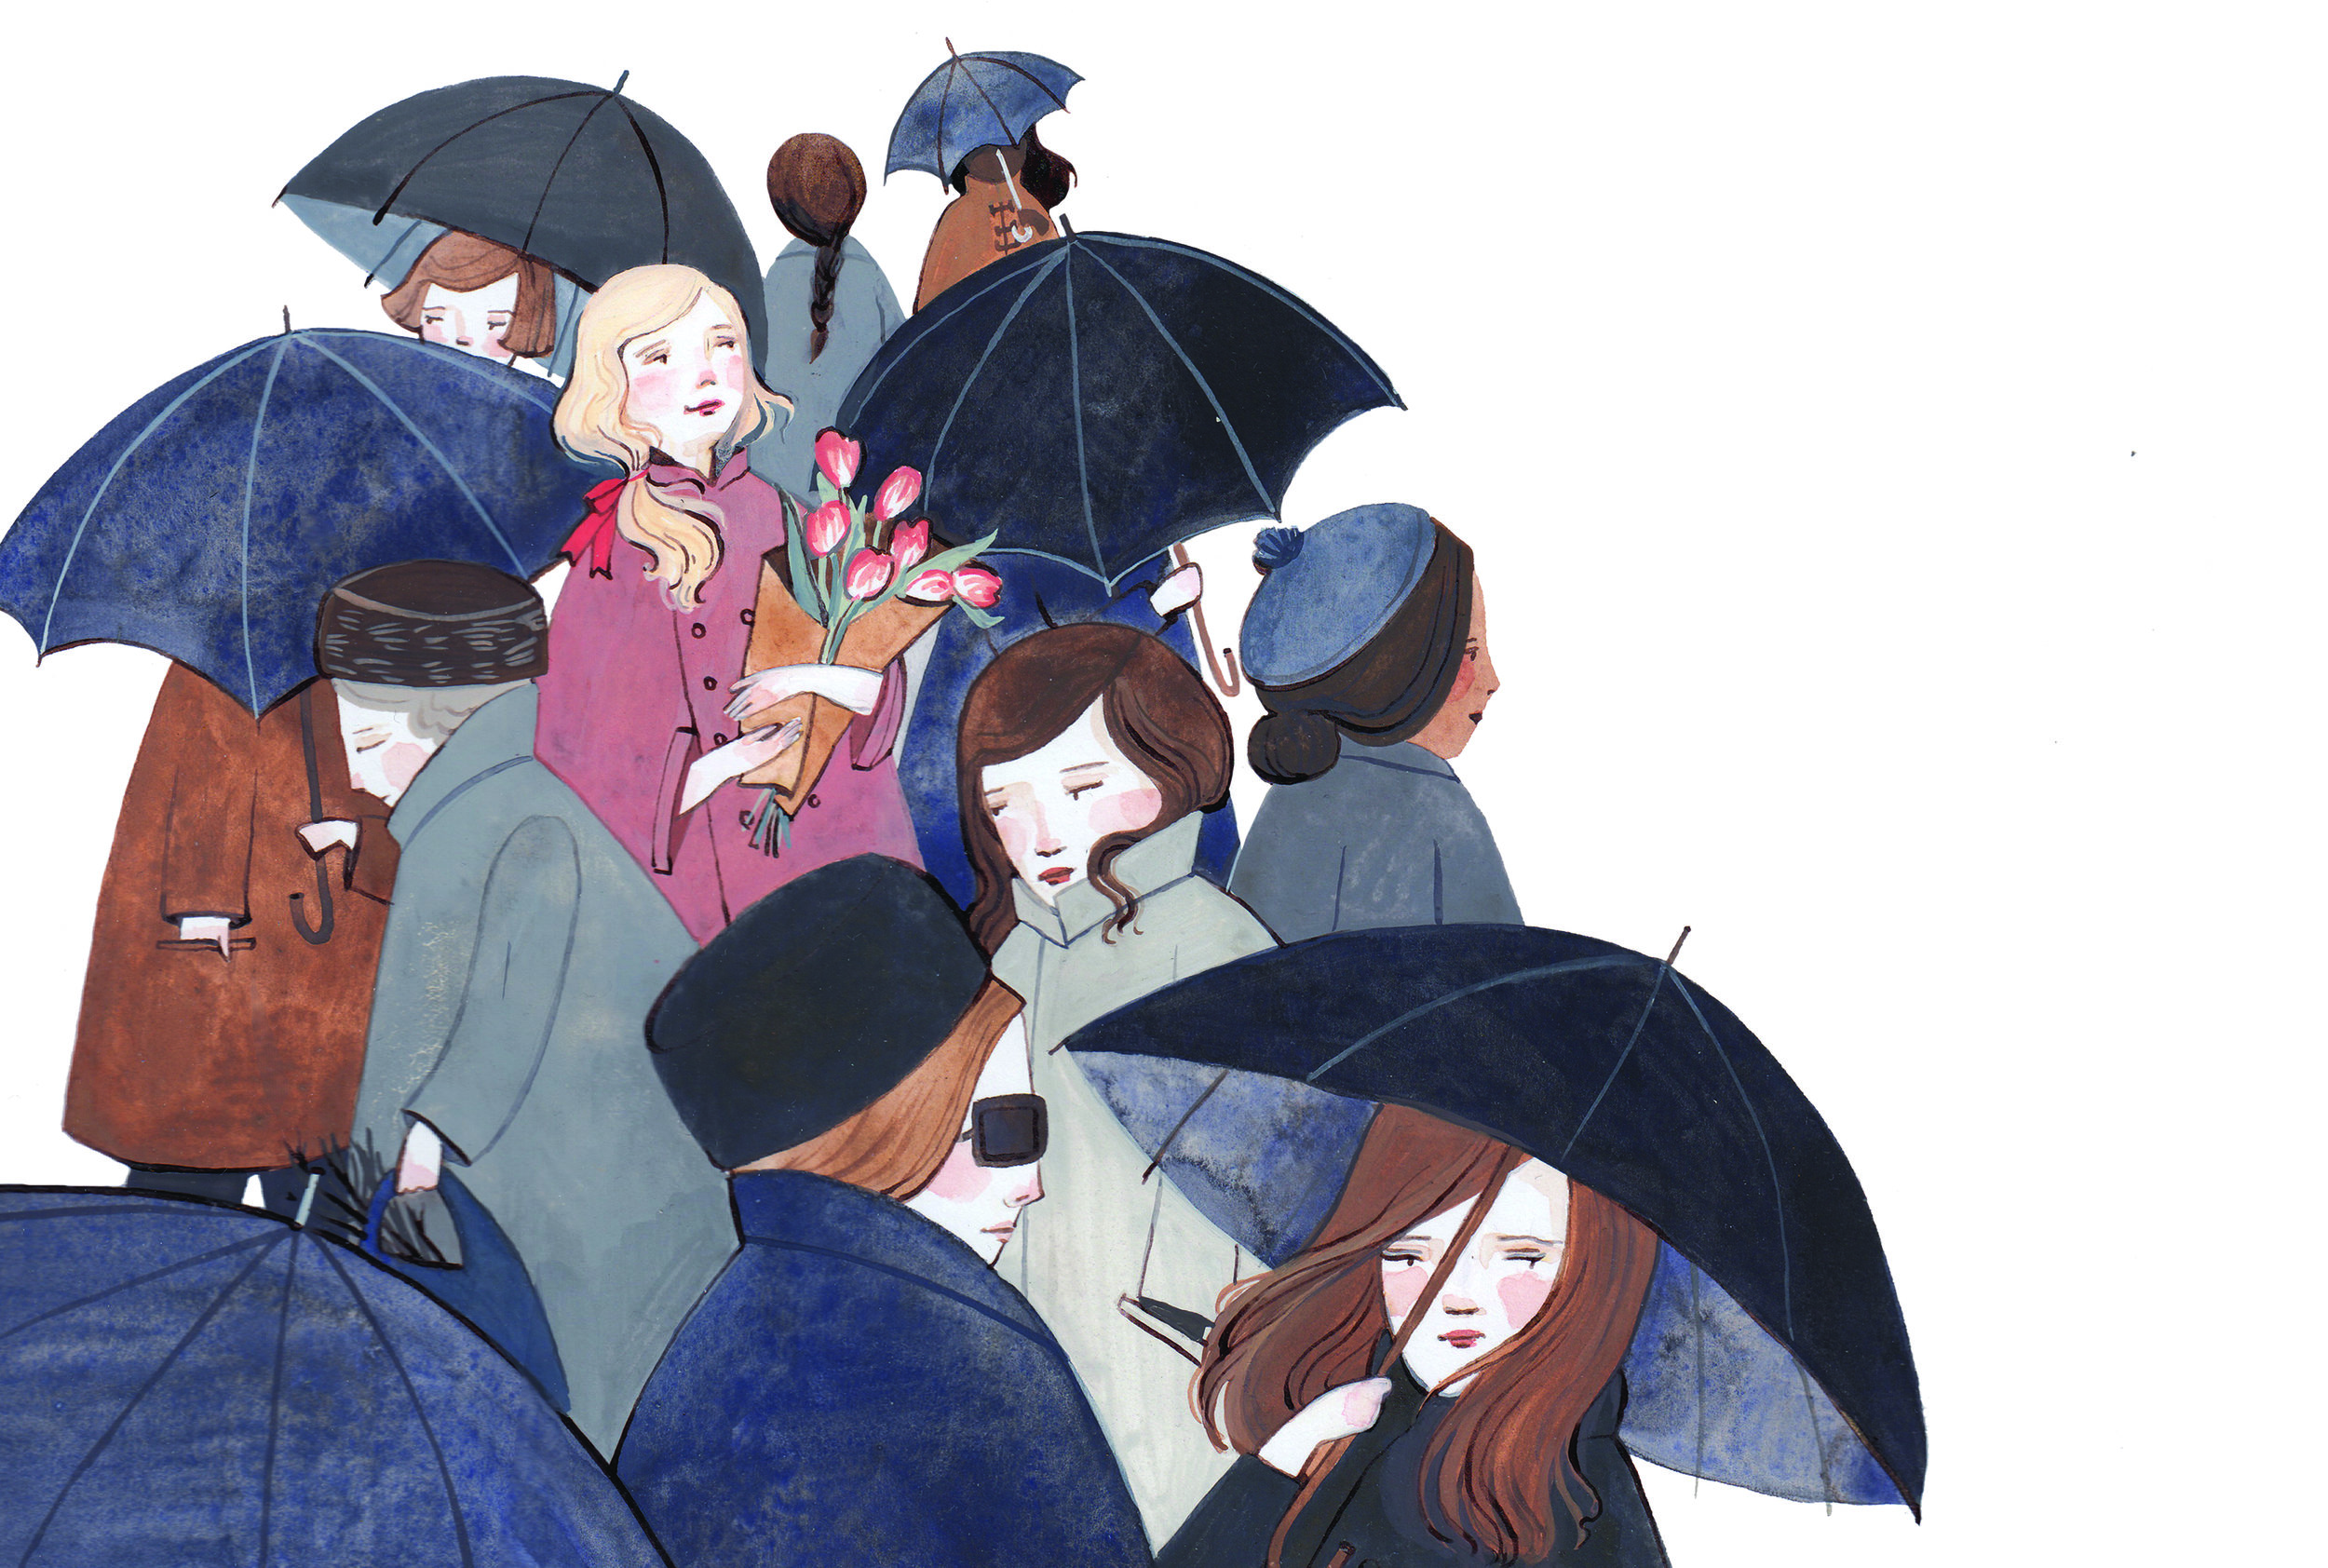 ow-painted-umbrellas-1.jpg